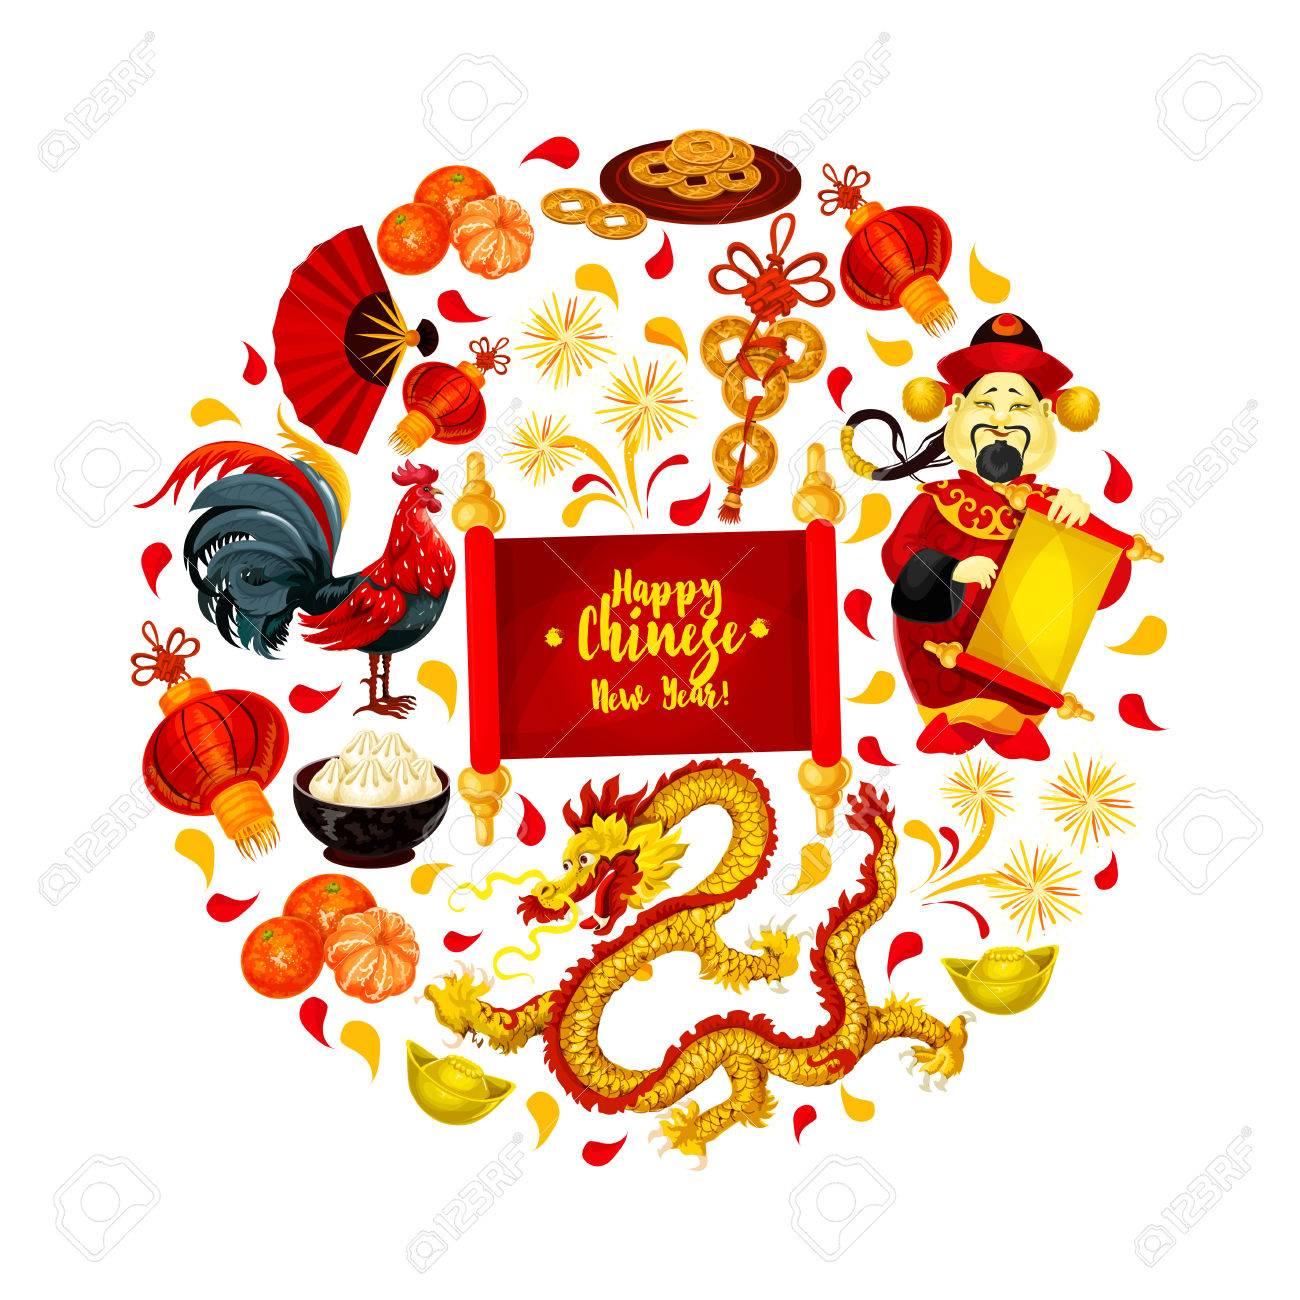 Chinese New Year Festliche Symbole Runde Plakat. Hahn, Rote Laterne ...